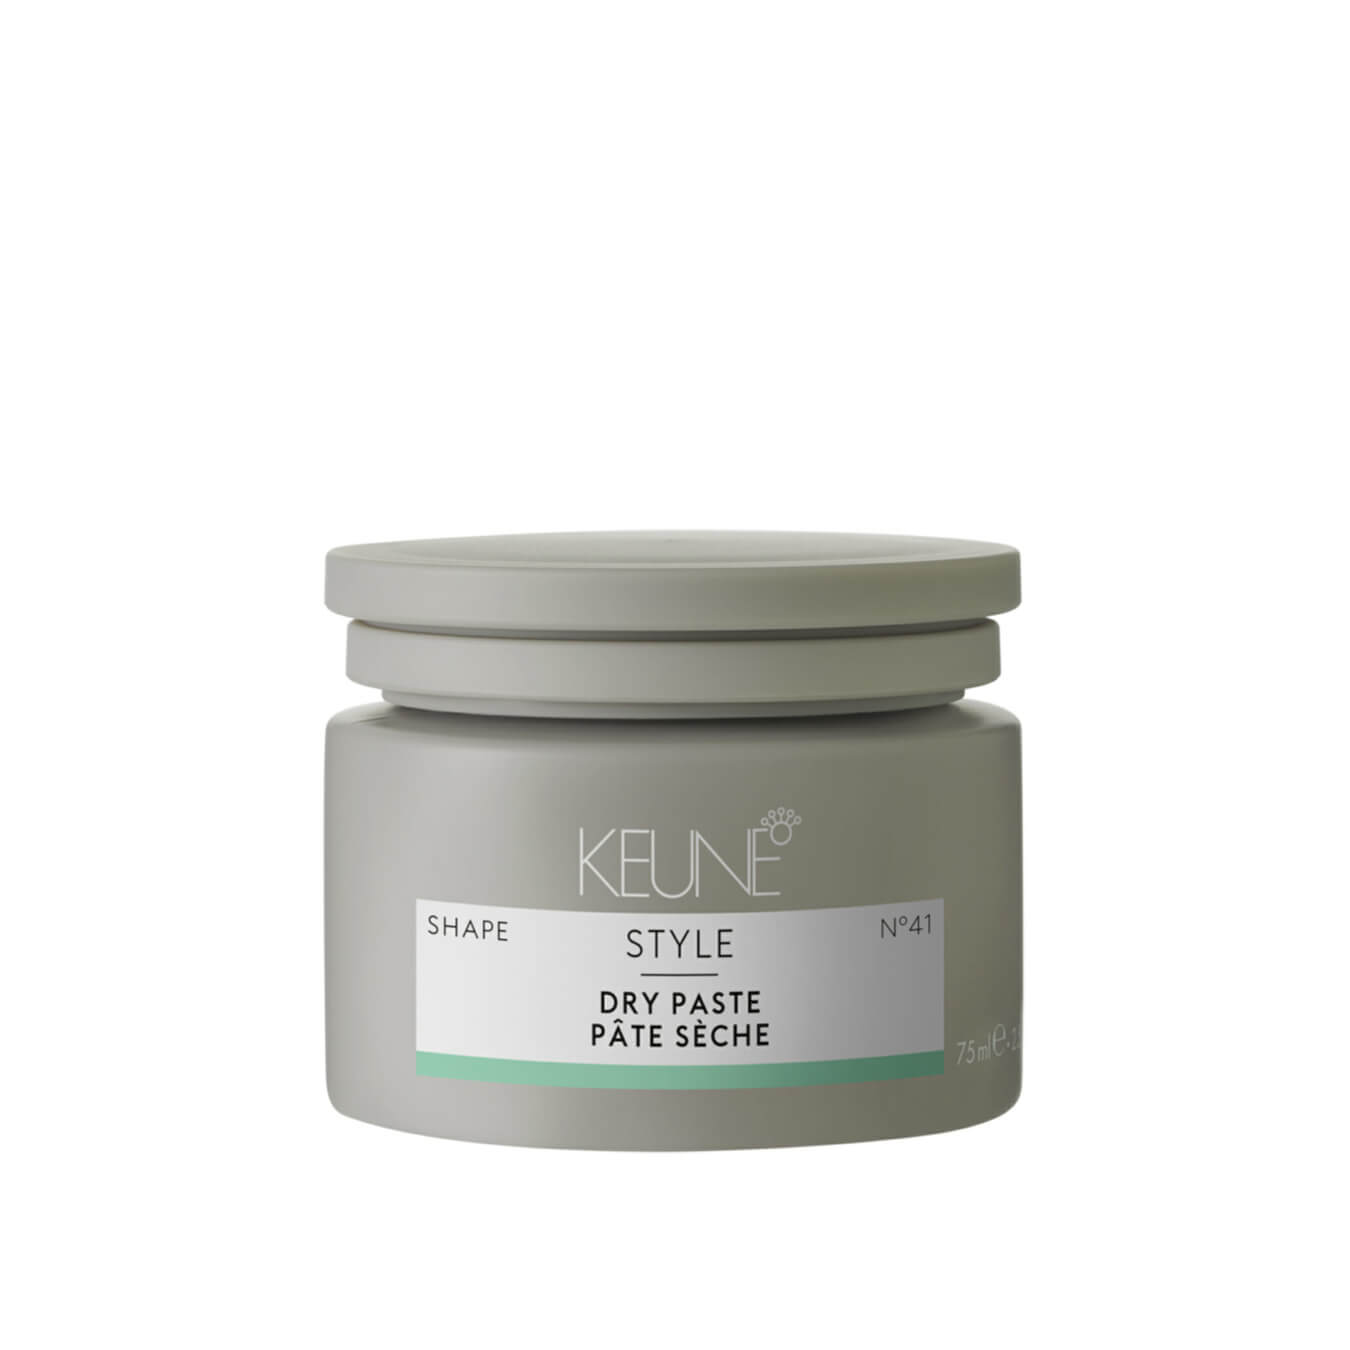 Koop Keune Style Dry Paste 75ml